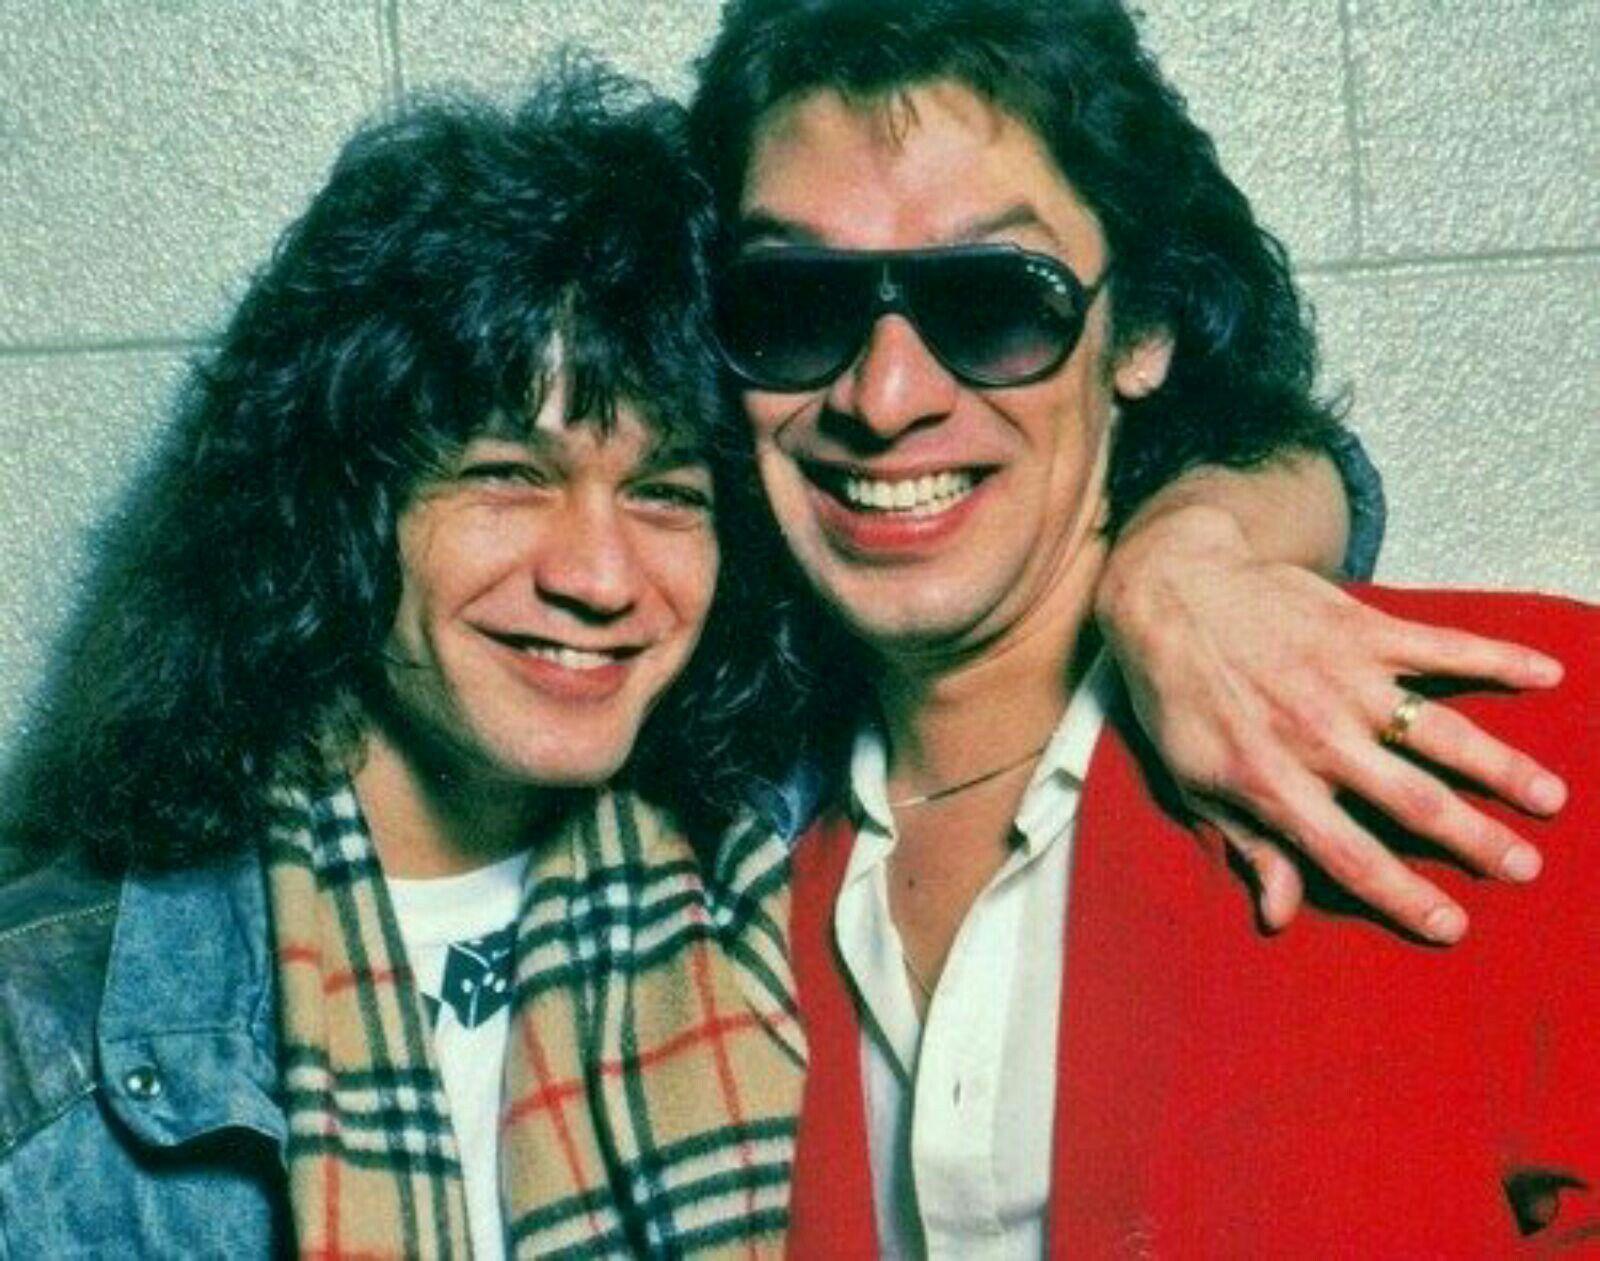 Eddie Alex 3 With Images Van Halen Alex Van Halen Eddie Van Halen